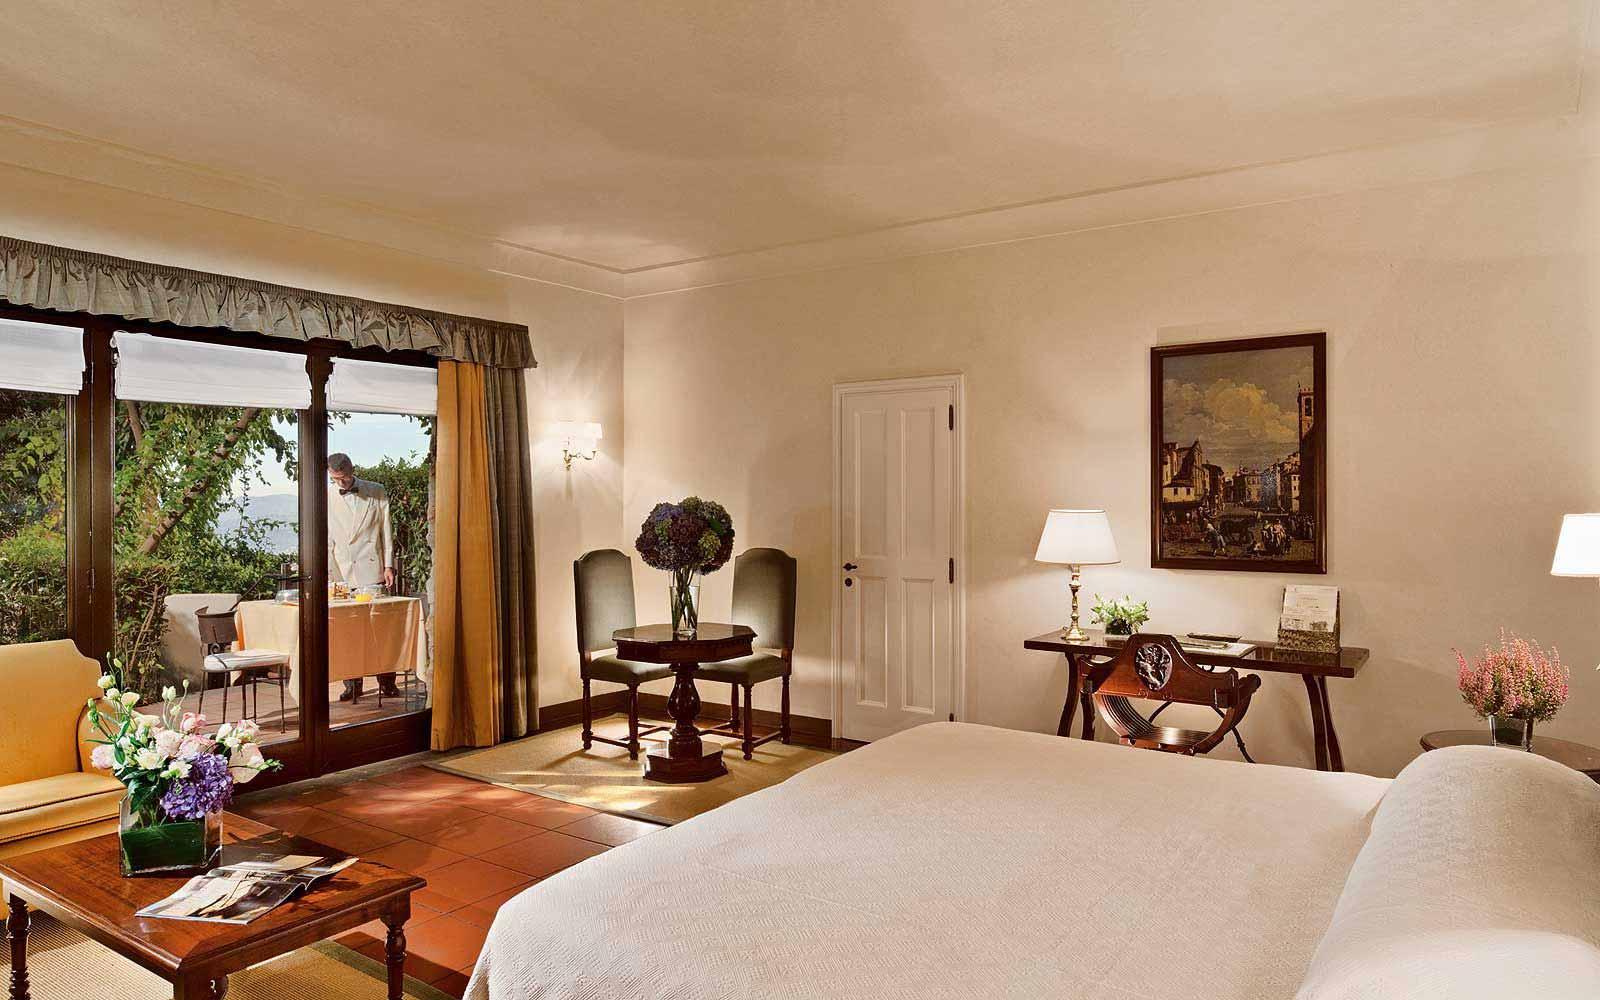 Deluxe Junior Suite at Belmond Villa San Michele